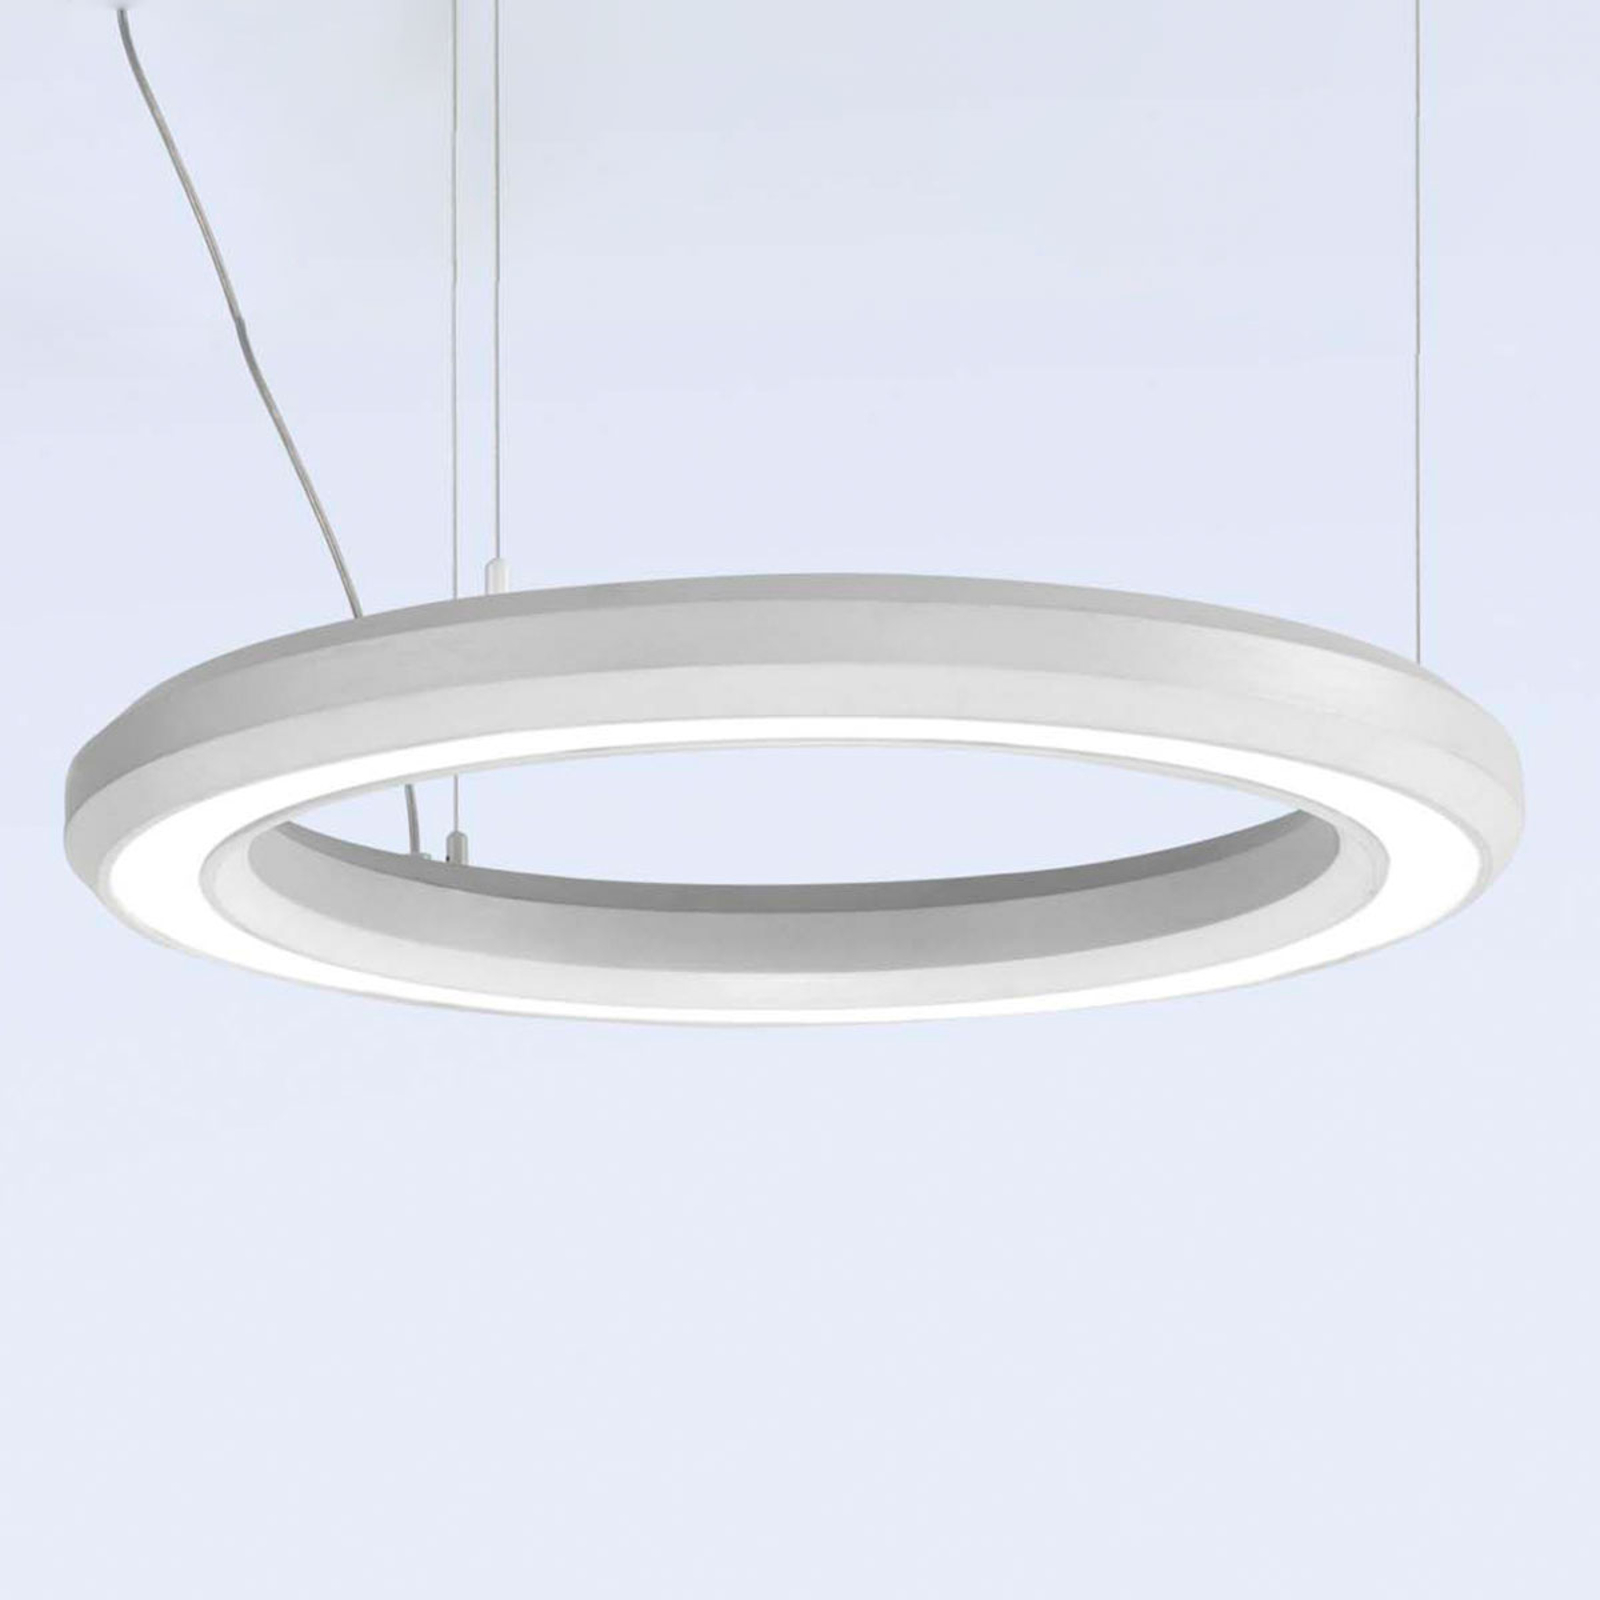 Lampa wisząca LED Materica dolna Ø 60cm biała